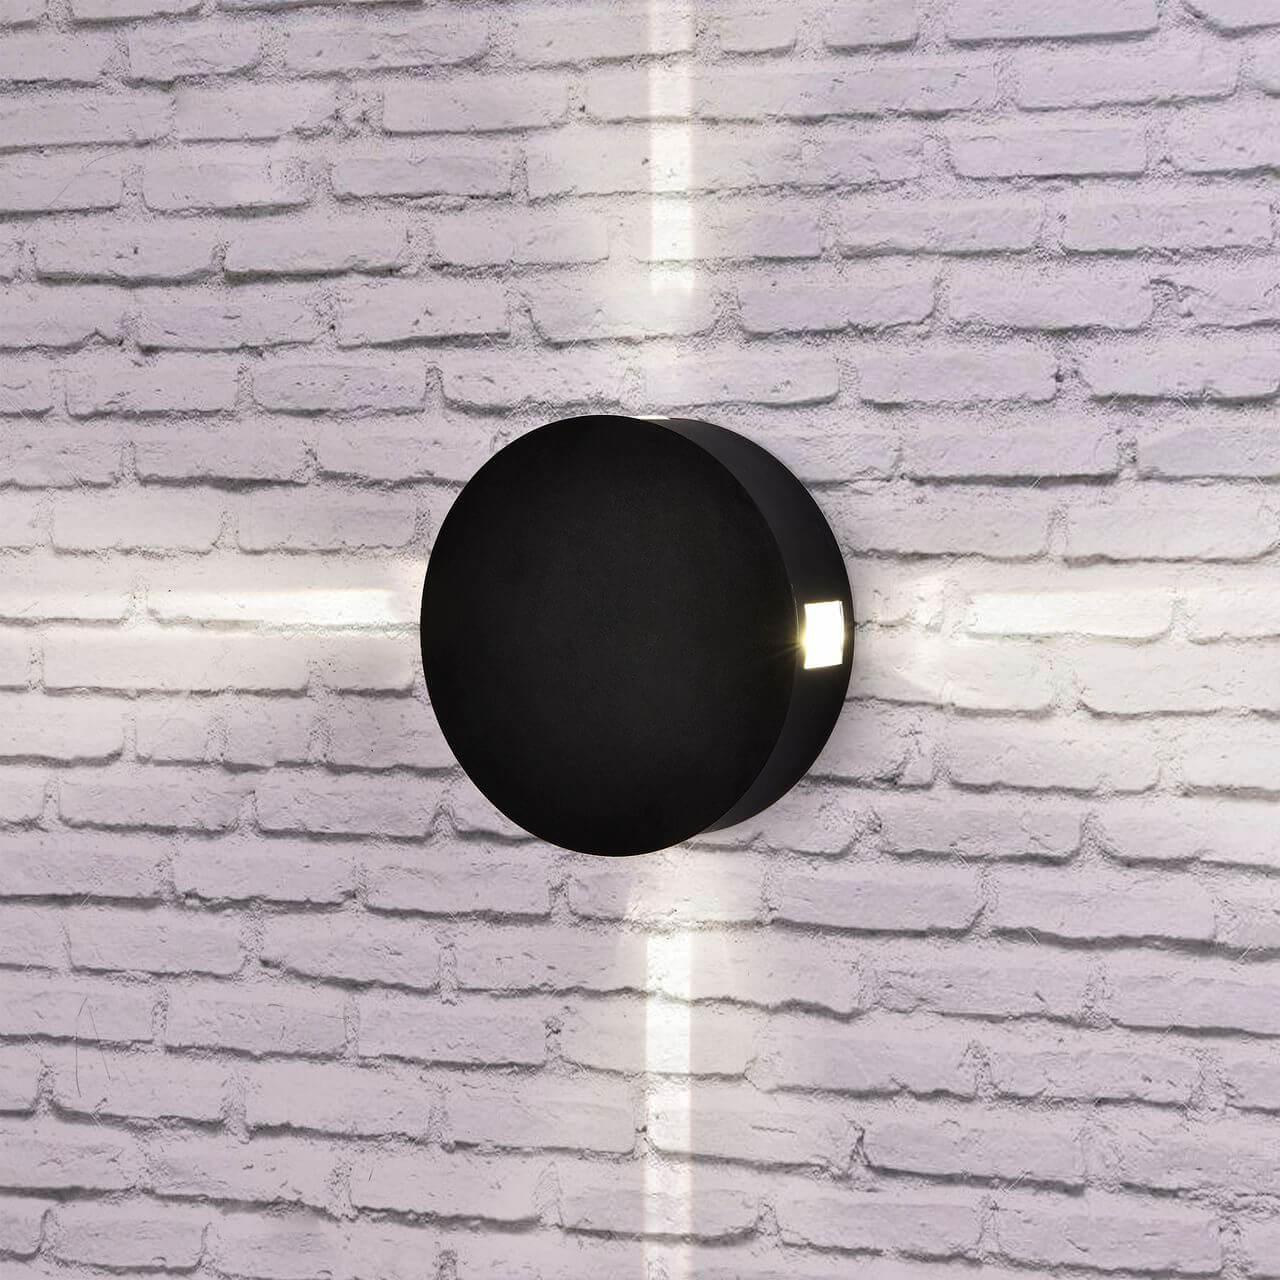 Уличный настенный светодиодный светильник Elektrostandard 1545 Techno LED Beam черный 4690389121654 akd car styling angel eye fog lamp for mitsubishi pajero led fog light led drl 90mm high beam low beam lighting accessories